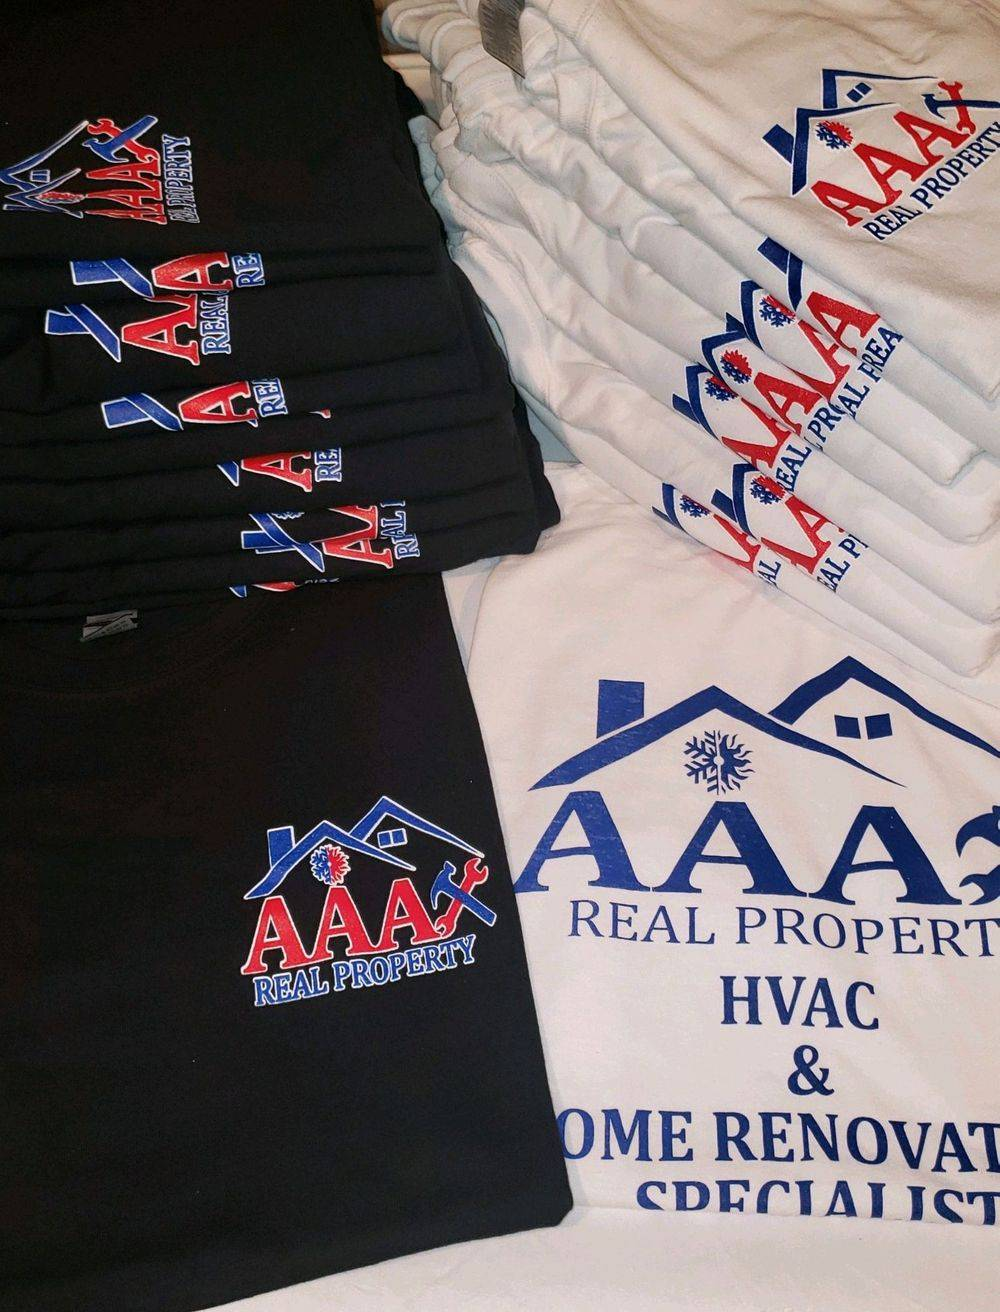 home improvement apparel